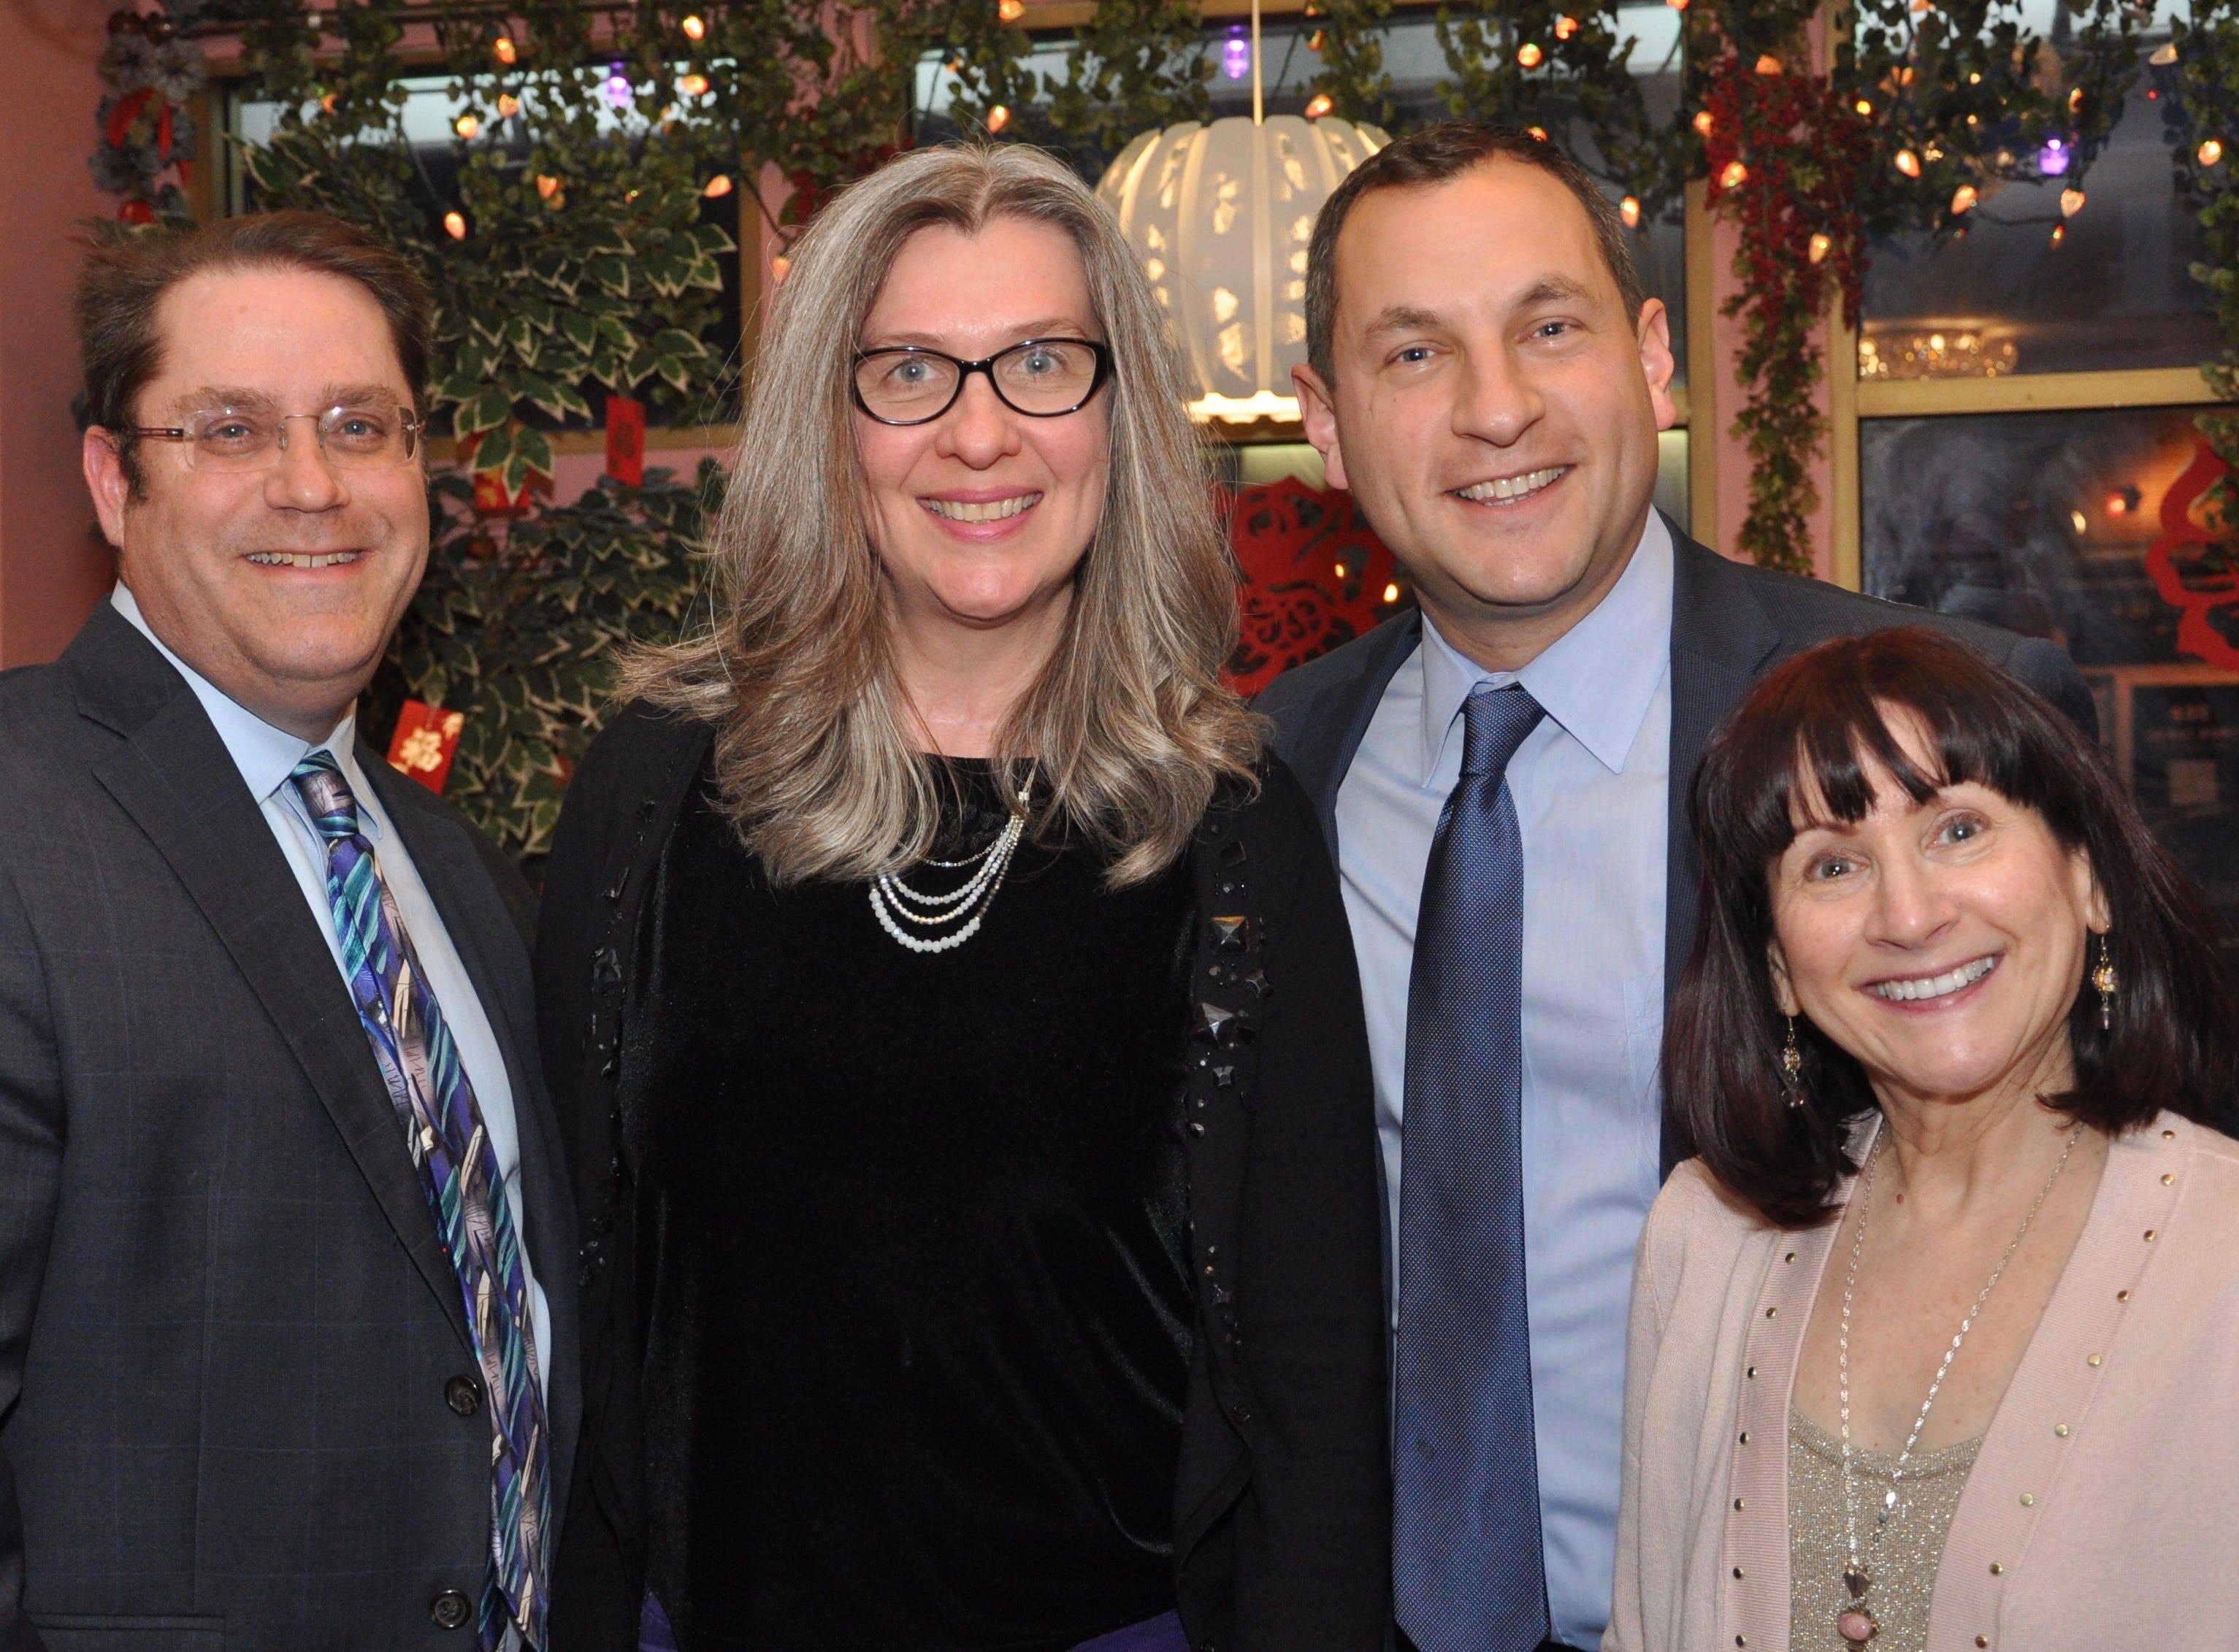 (Left to right)Metuchen Councilman Dan Hirsch, Council President Linda Koskoski, Mayor Jonathan Busch and Councilwoman Dorothy Rasmussen.